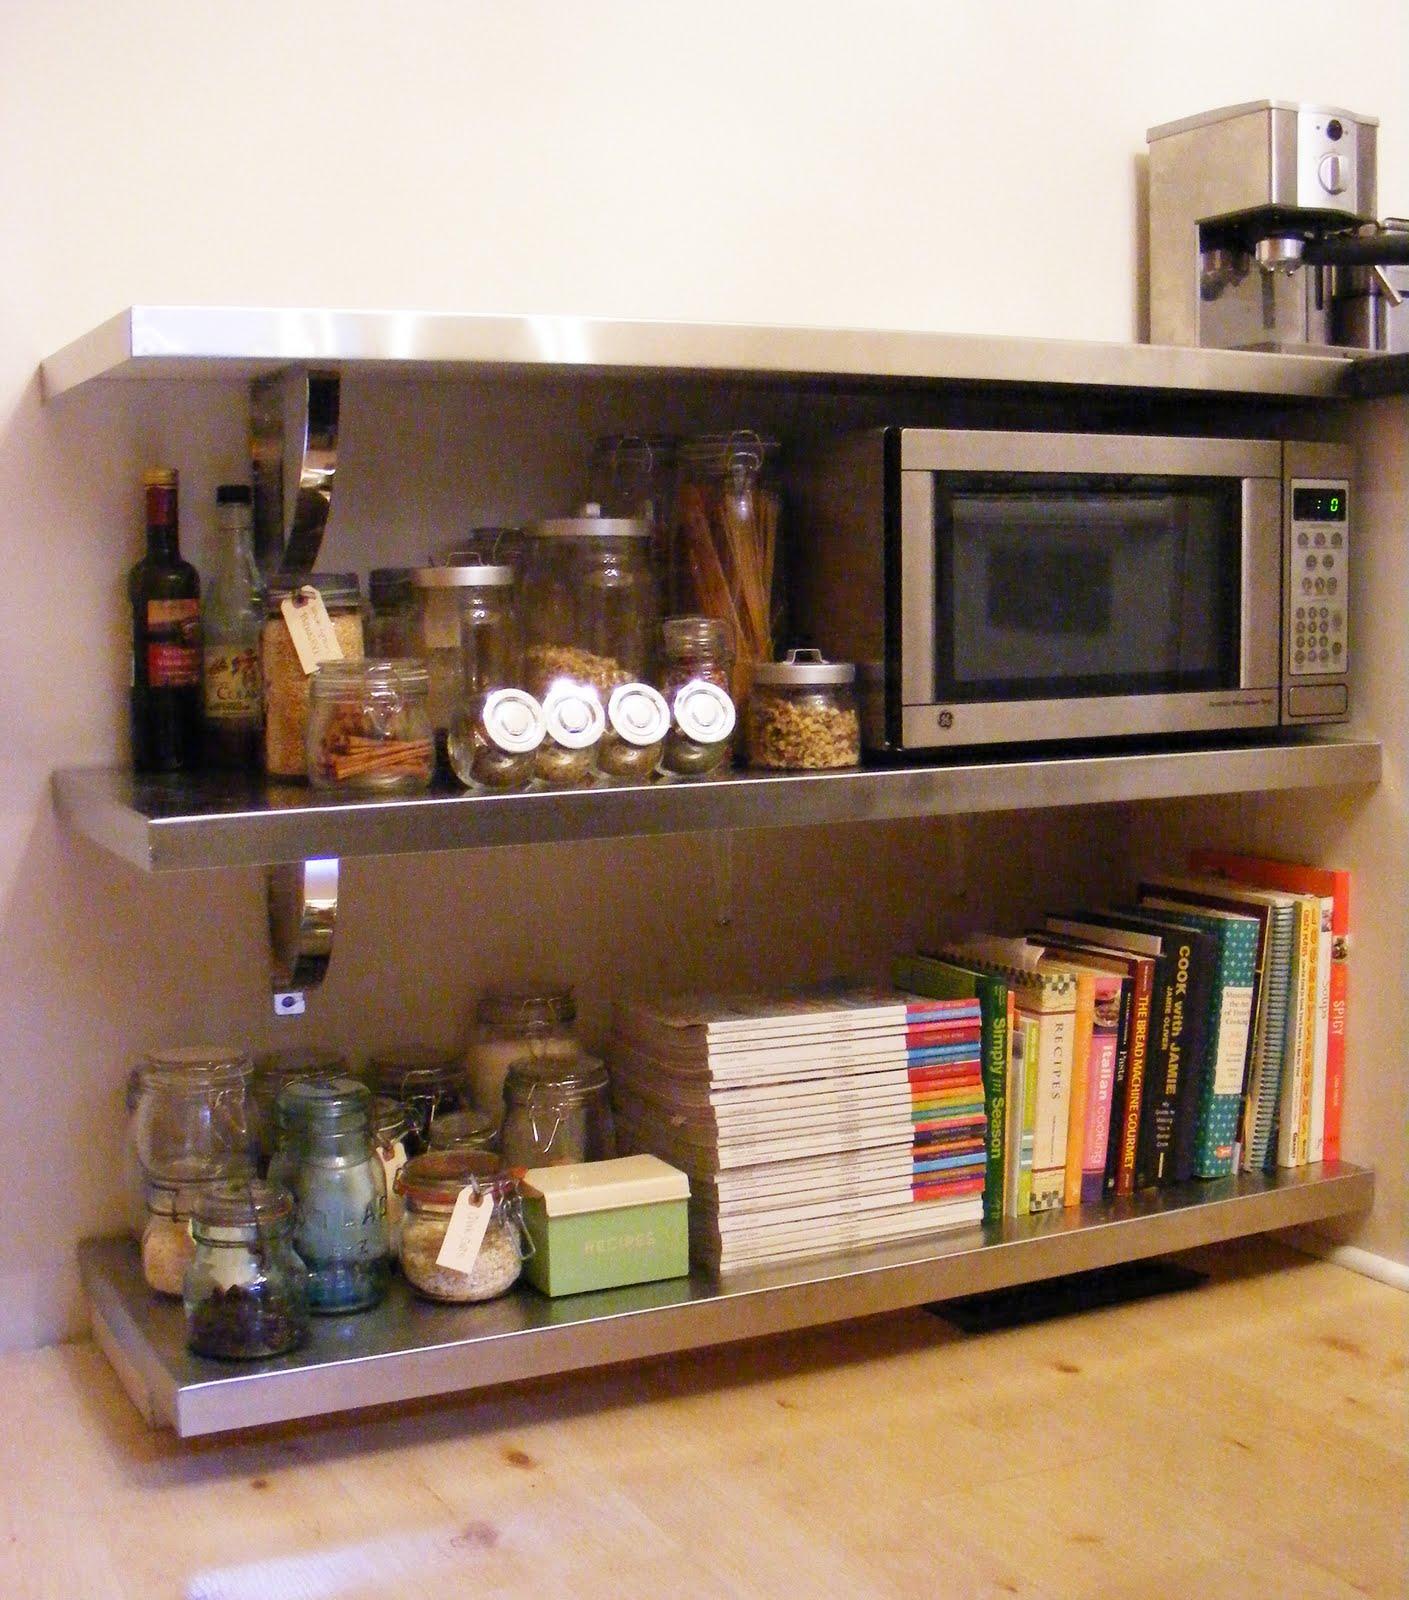 jenna rose journal: kitchen renovation: DIY stainless ...